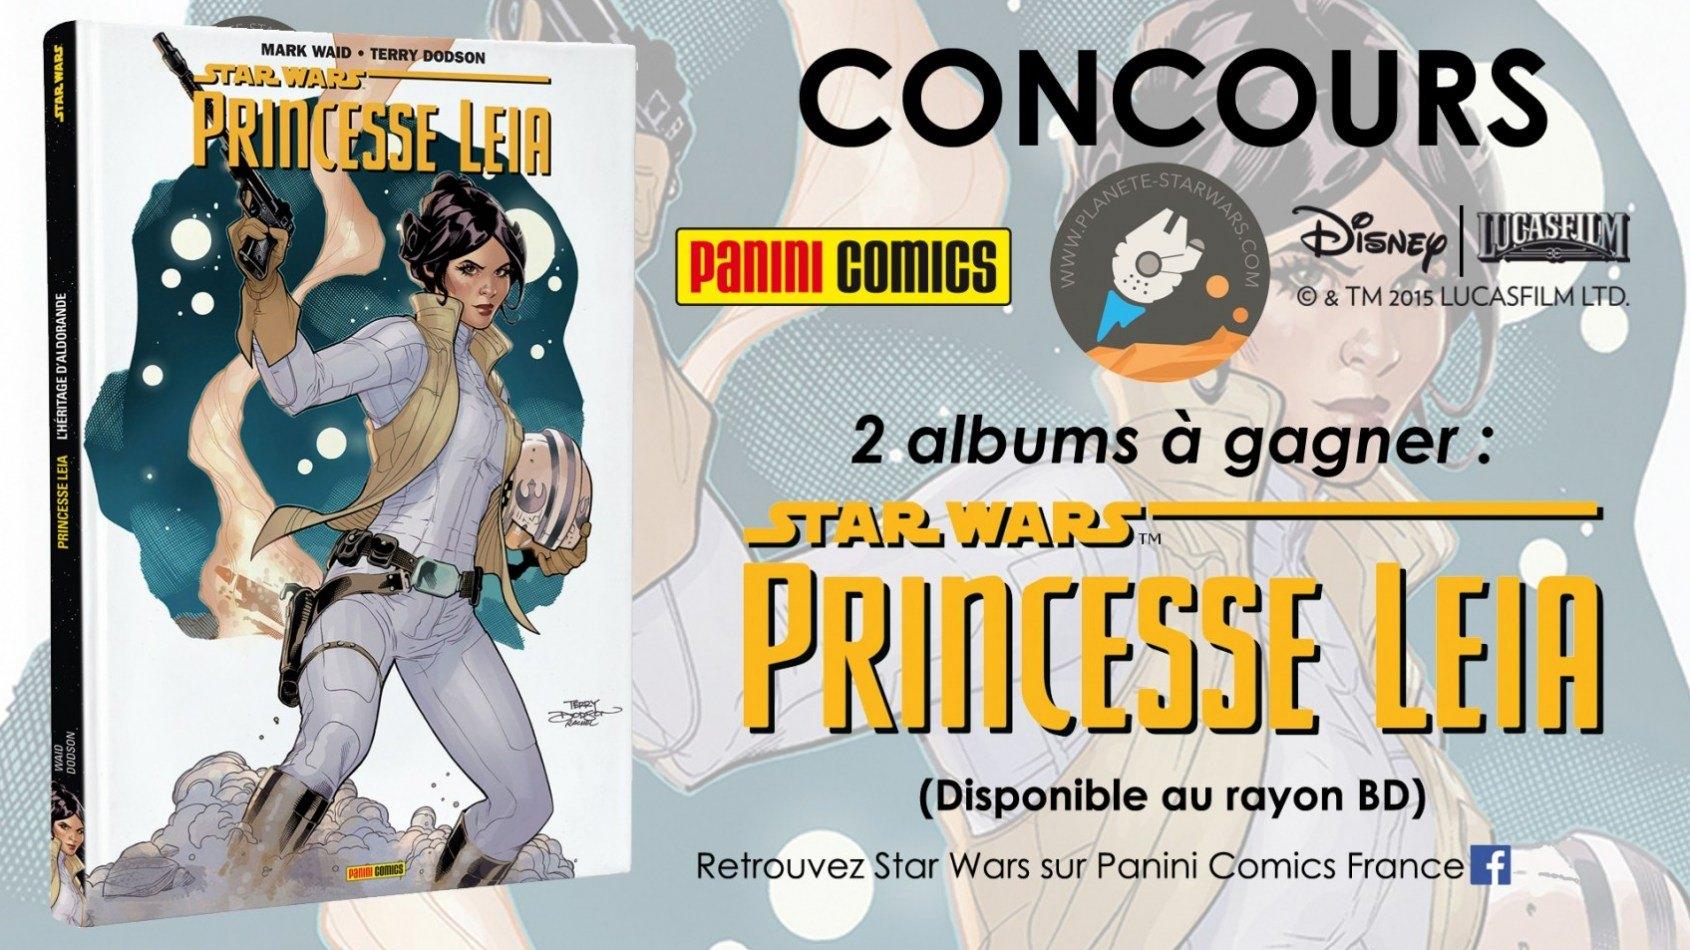 Concours : Gagnez l'album Princesse Leia de Panini